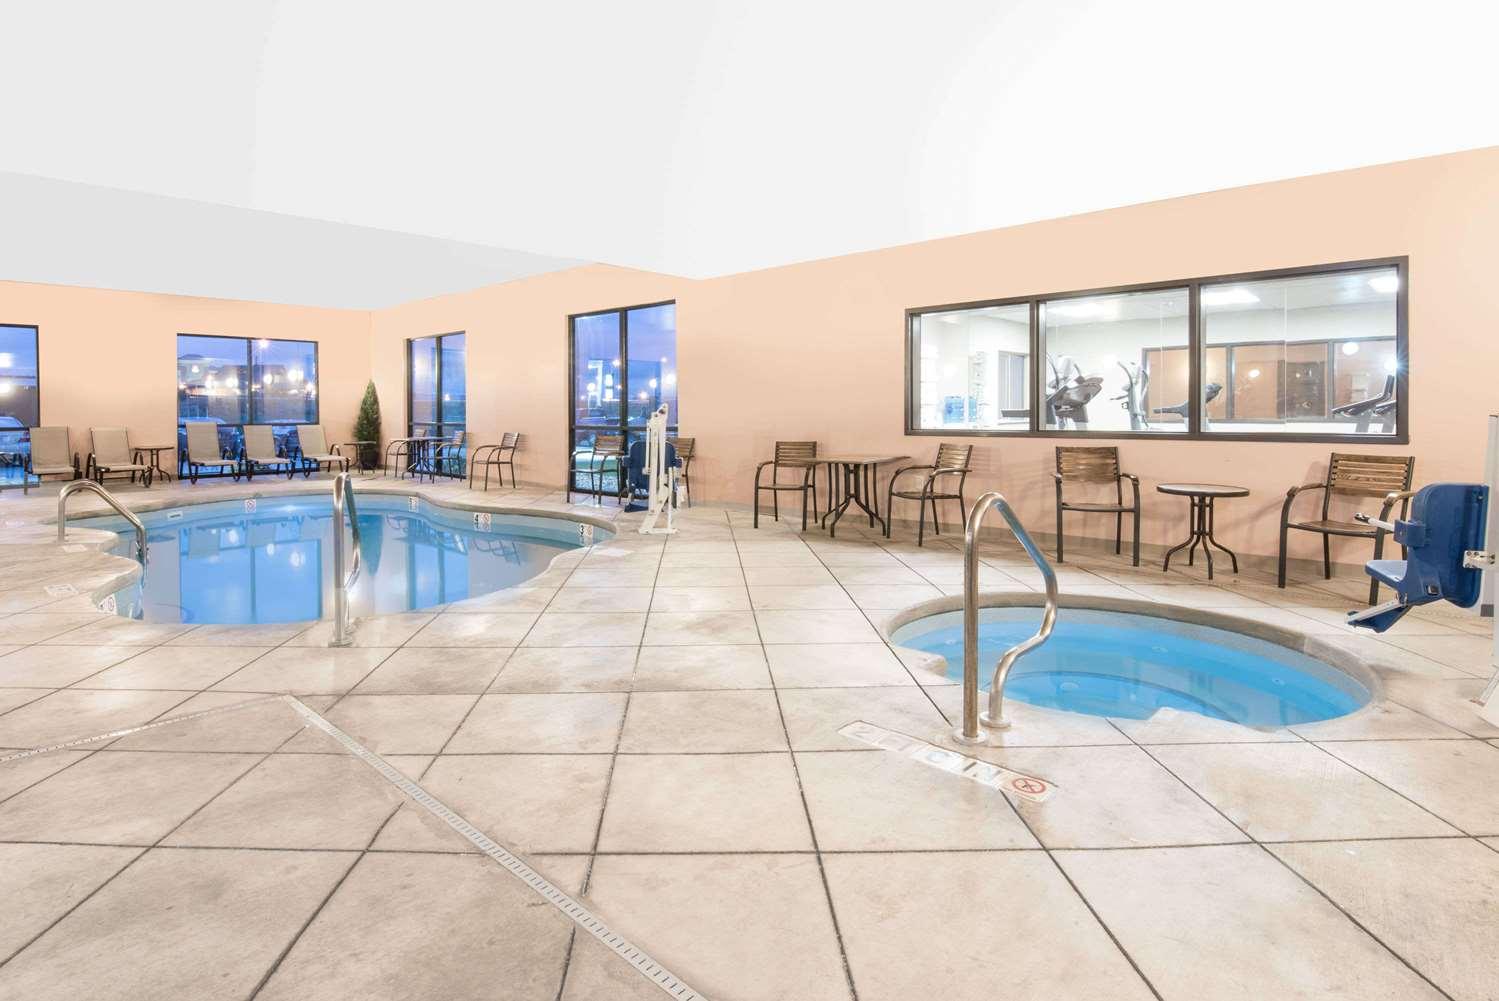 Pool - Baymont Inn & Suites Rapid City